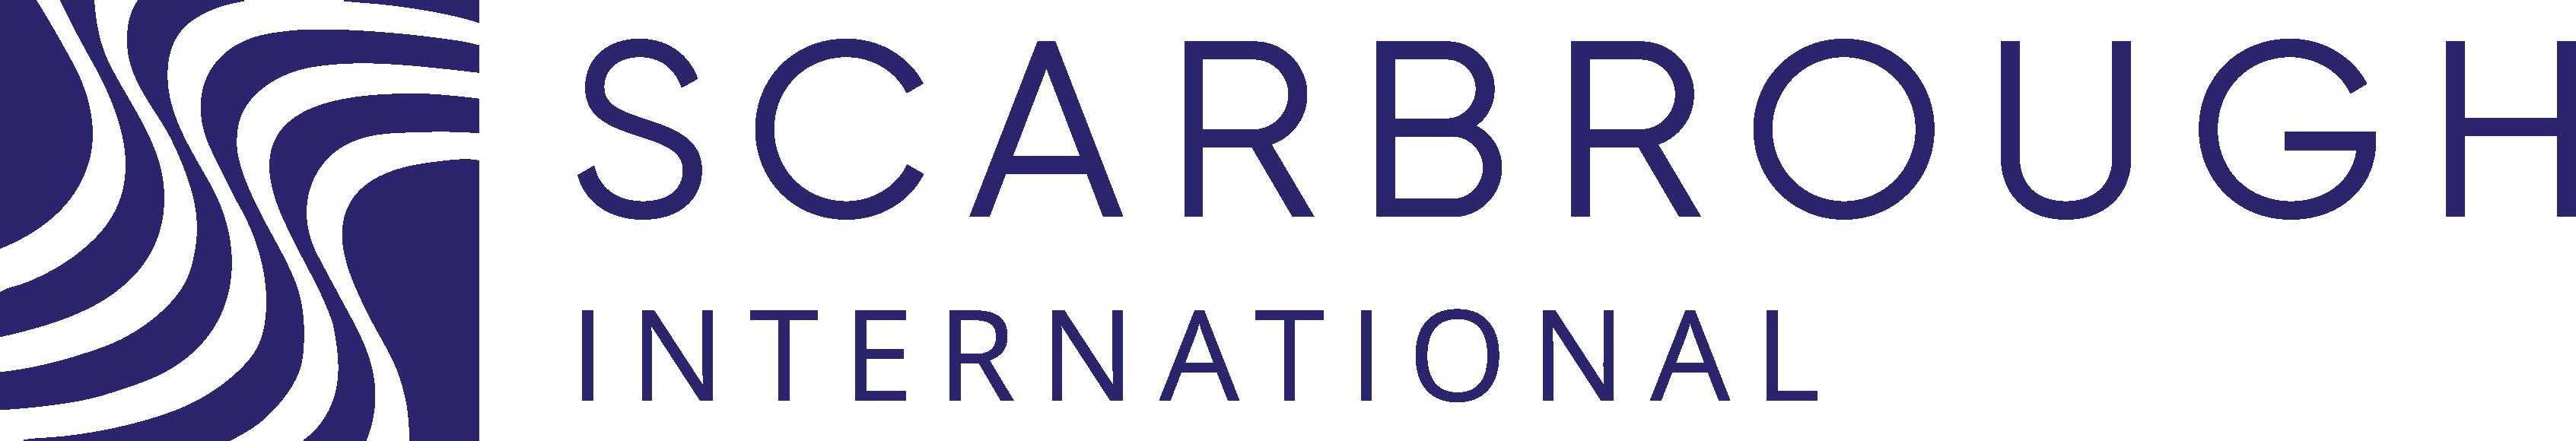 Scarbrough International logo.